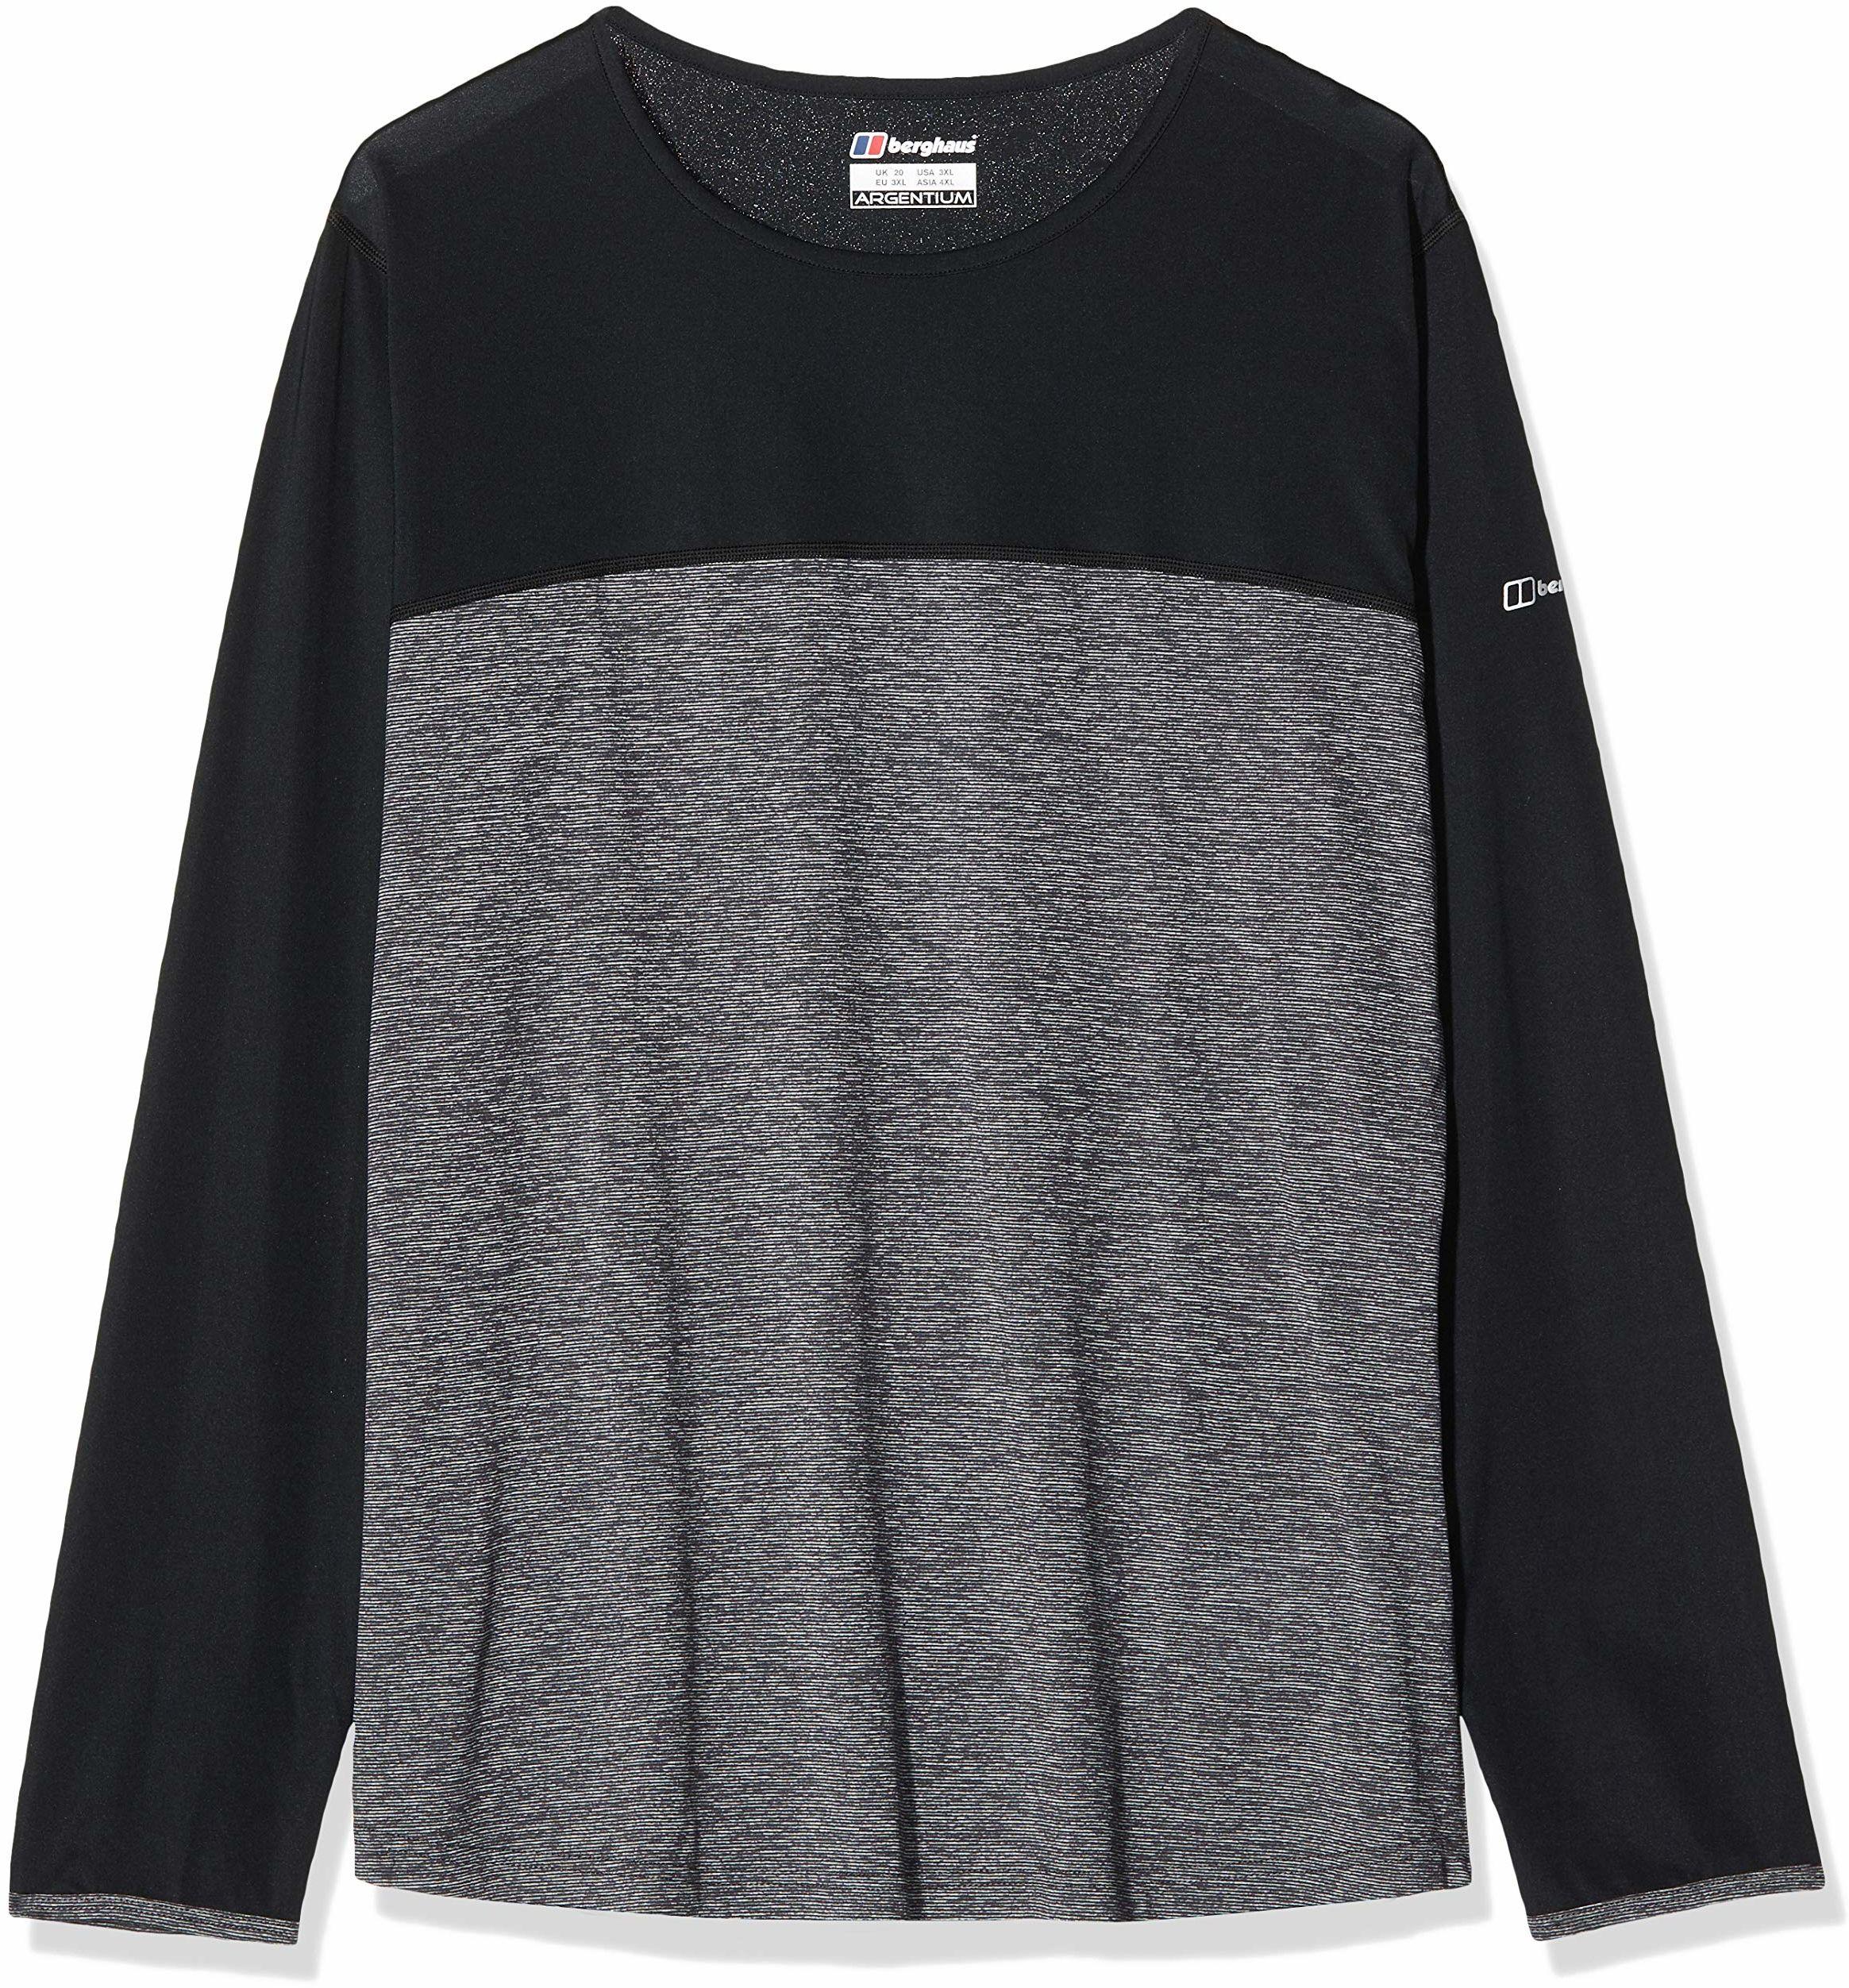 Berghaus koszulka damska Voyager z długim rękawem Tech Tee, Carbon Marl/Jet Black, 14